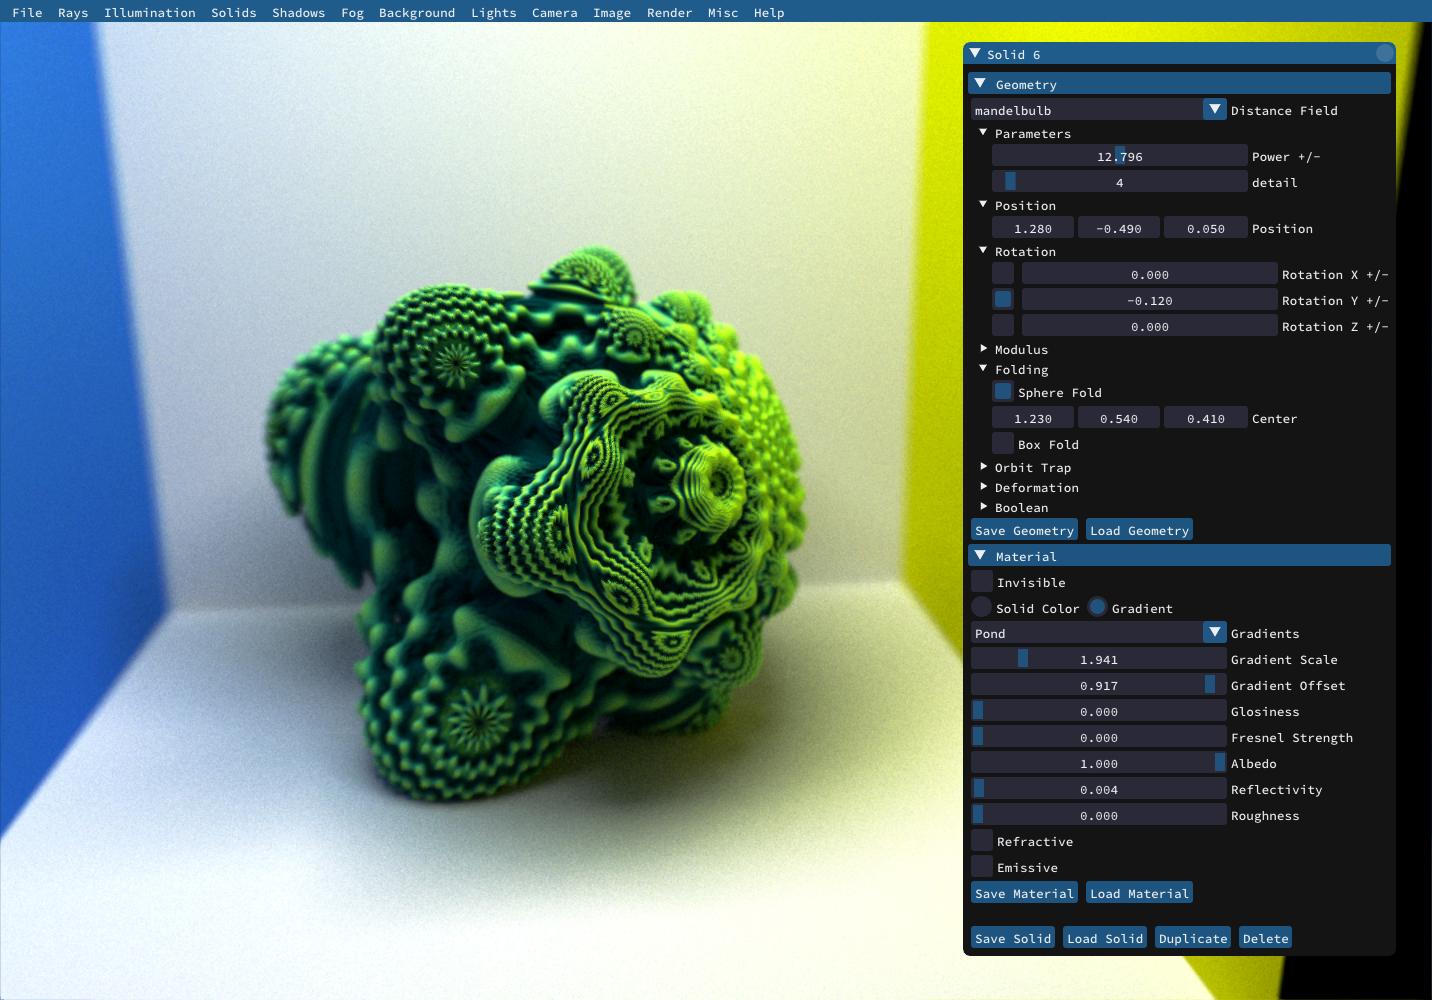 Developers - Gallery: Post your screenshots / code here